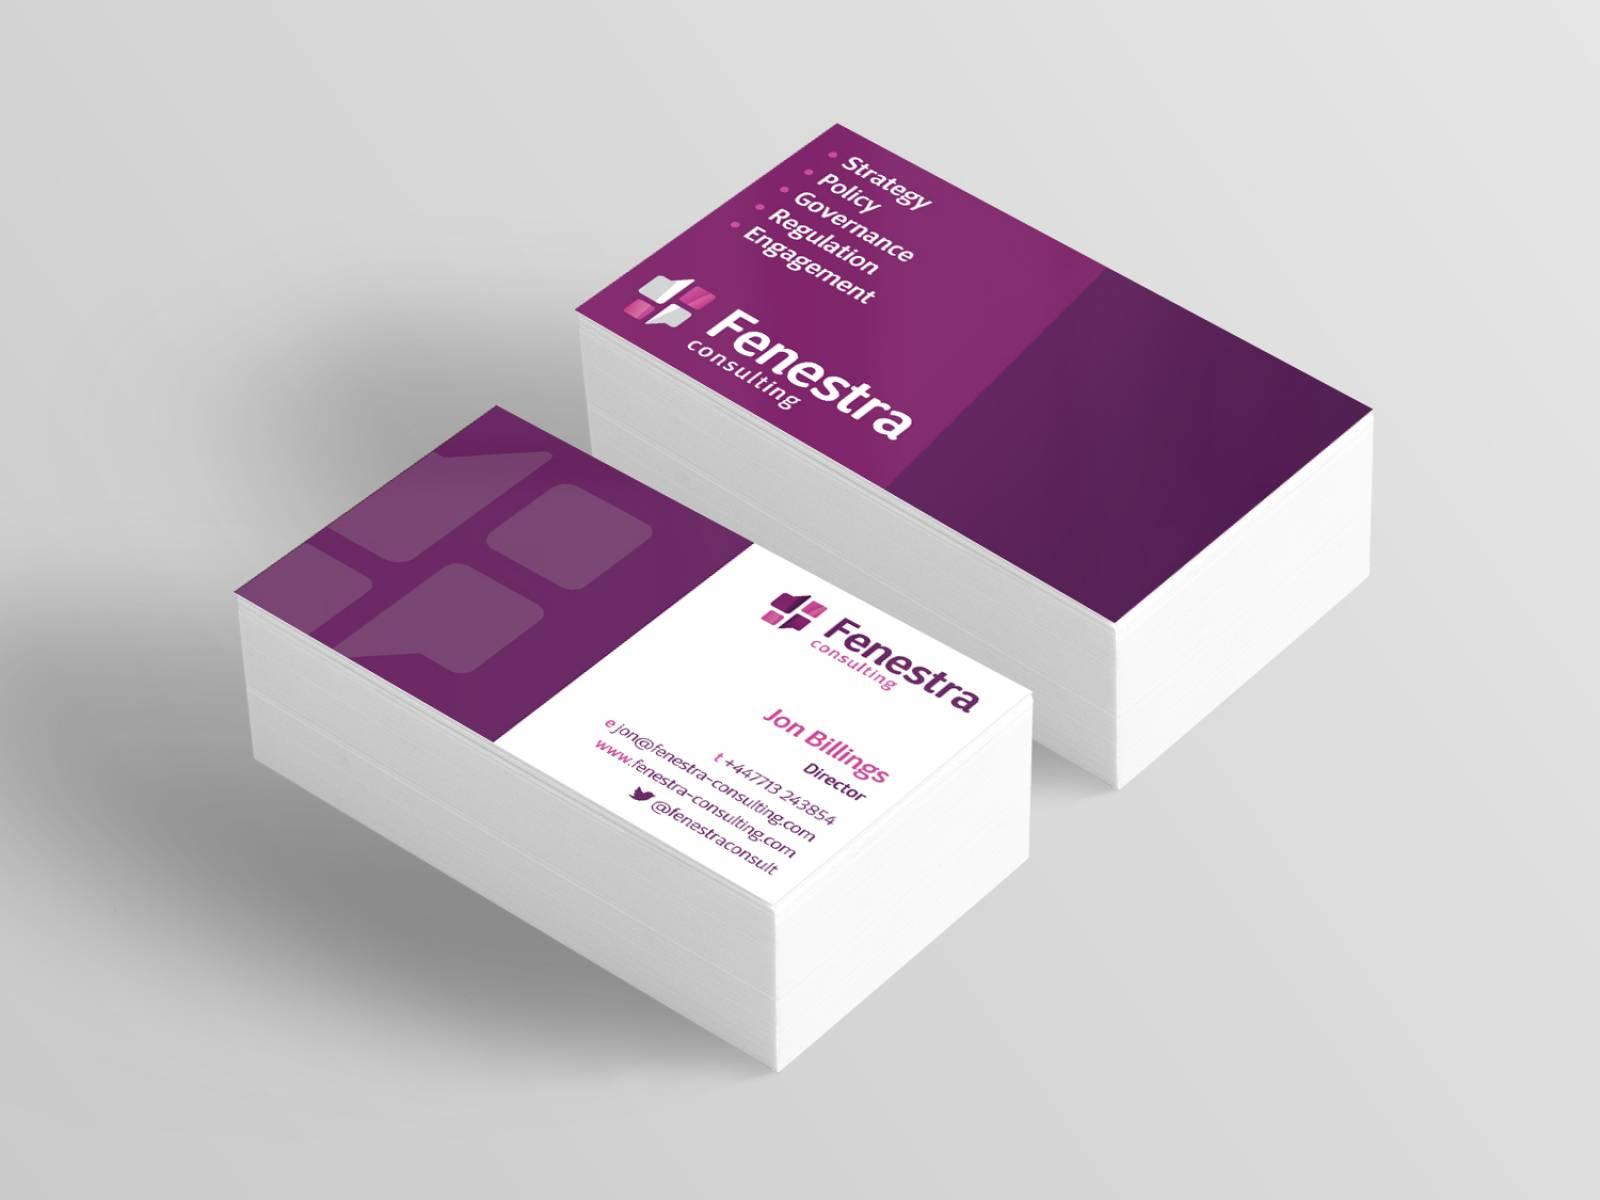 Fenestra-business-card-design-agency-graphic-design-canterbury.jpg